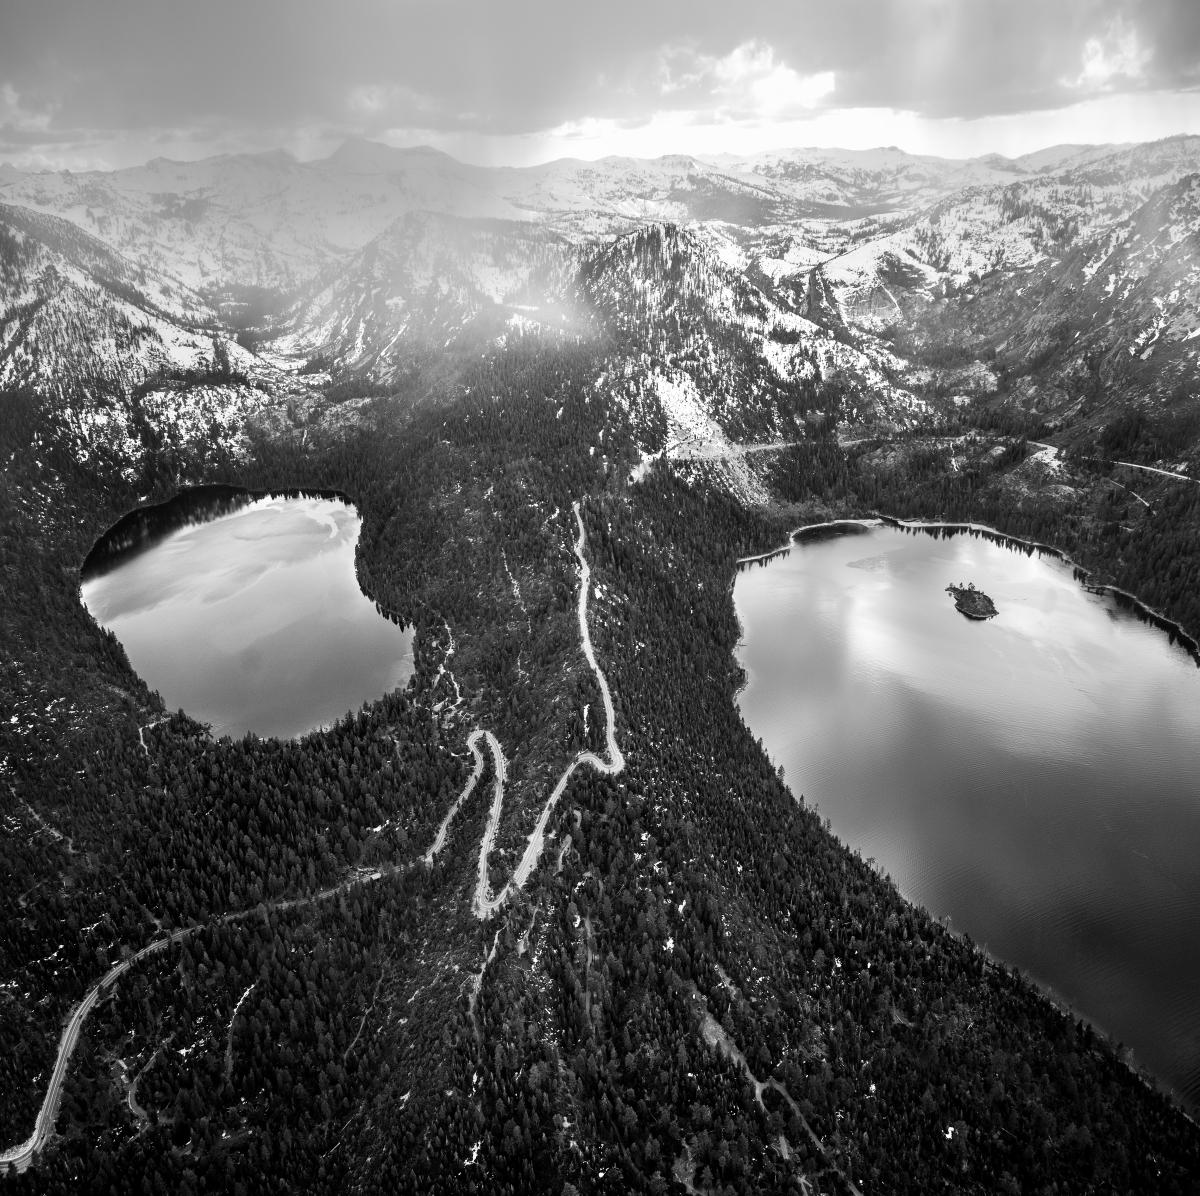 The Lake Tahoe region in art